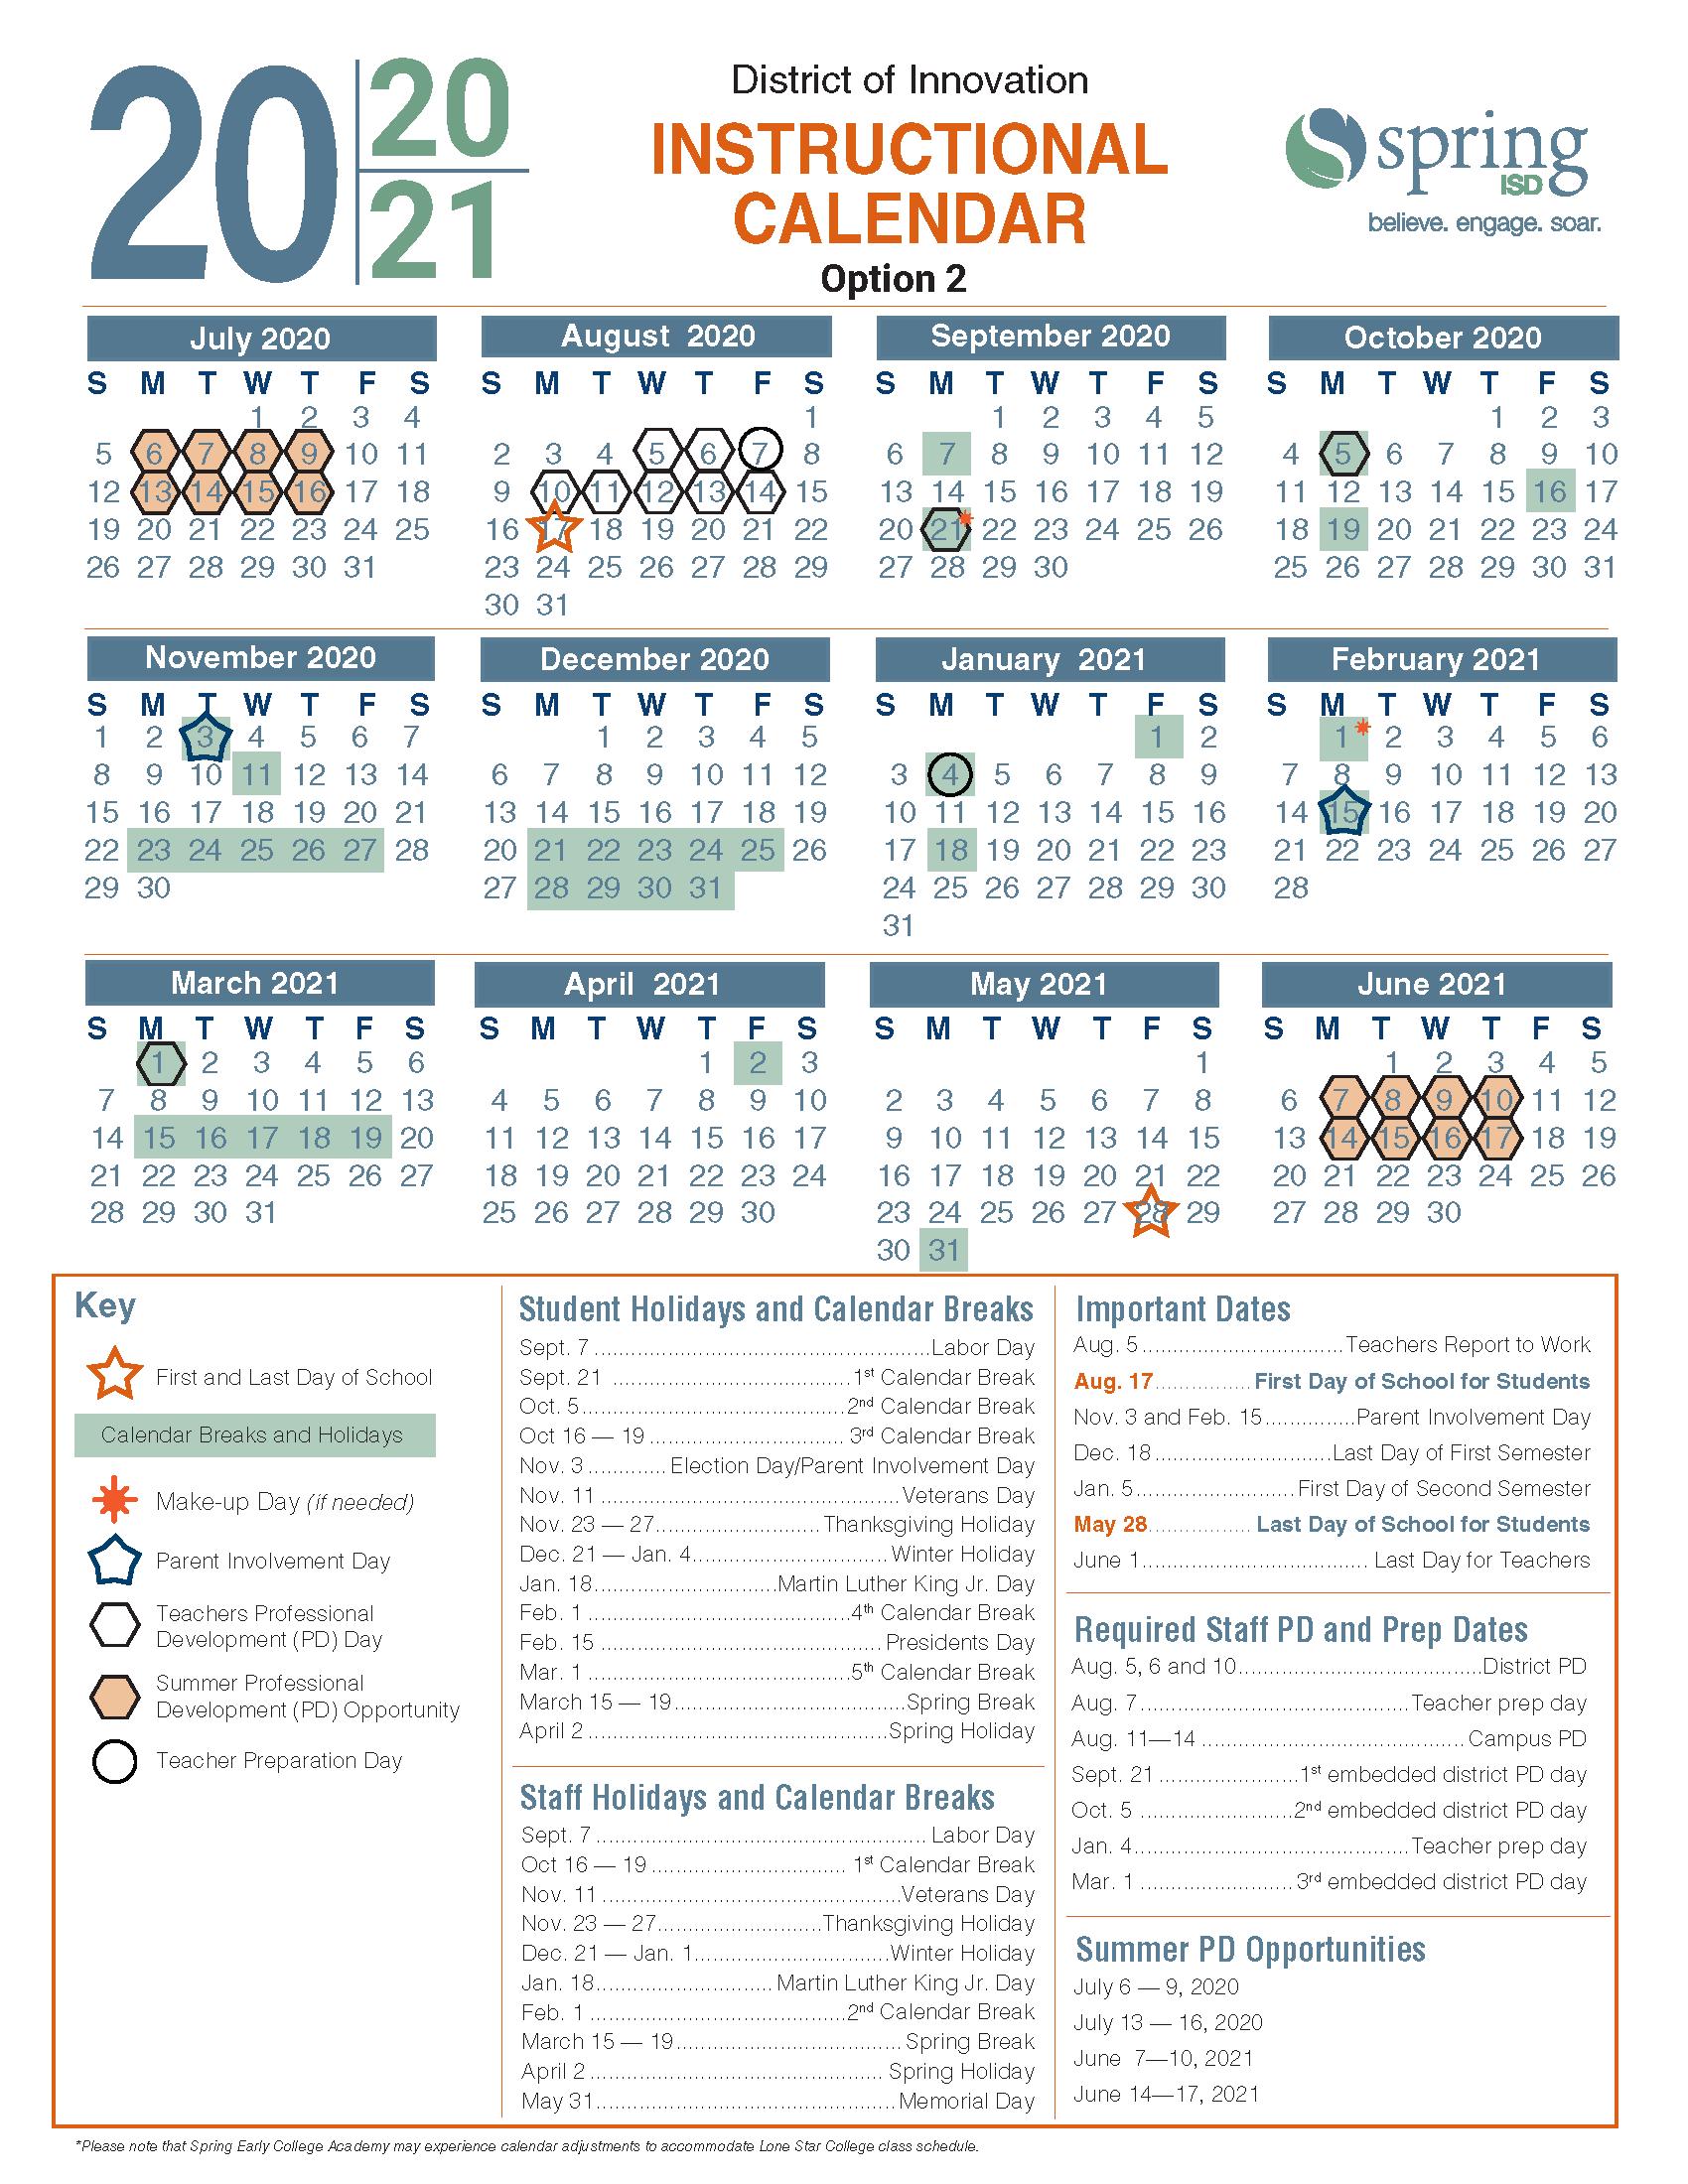 Spring 2021 Calendar Calendar Survey / 2020 21 Instructional Calendar / Calendario de